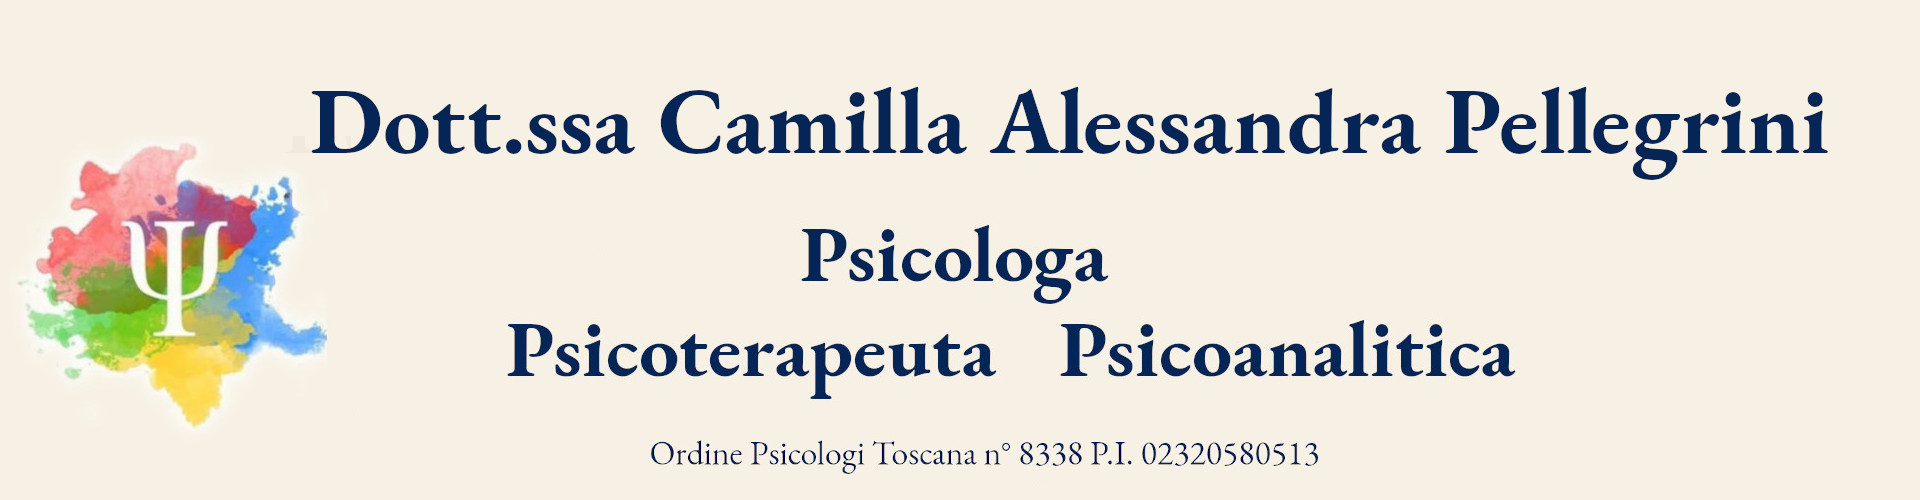 Dott.ssa Camilla Alessandra Pellegrini